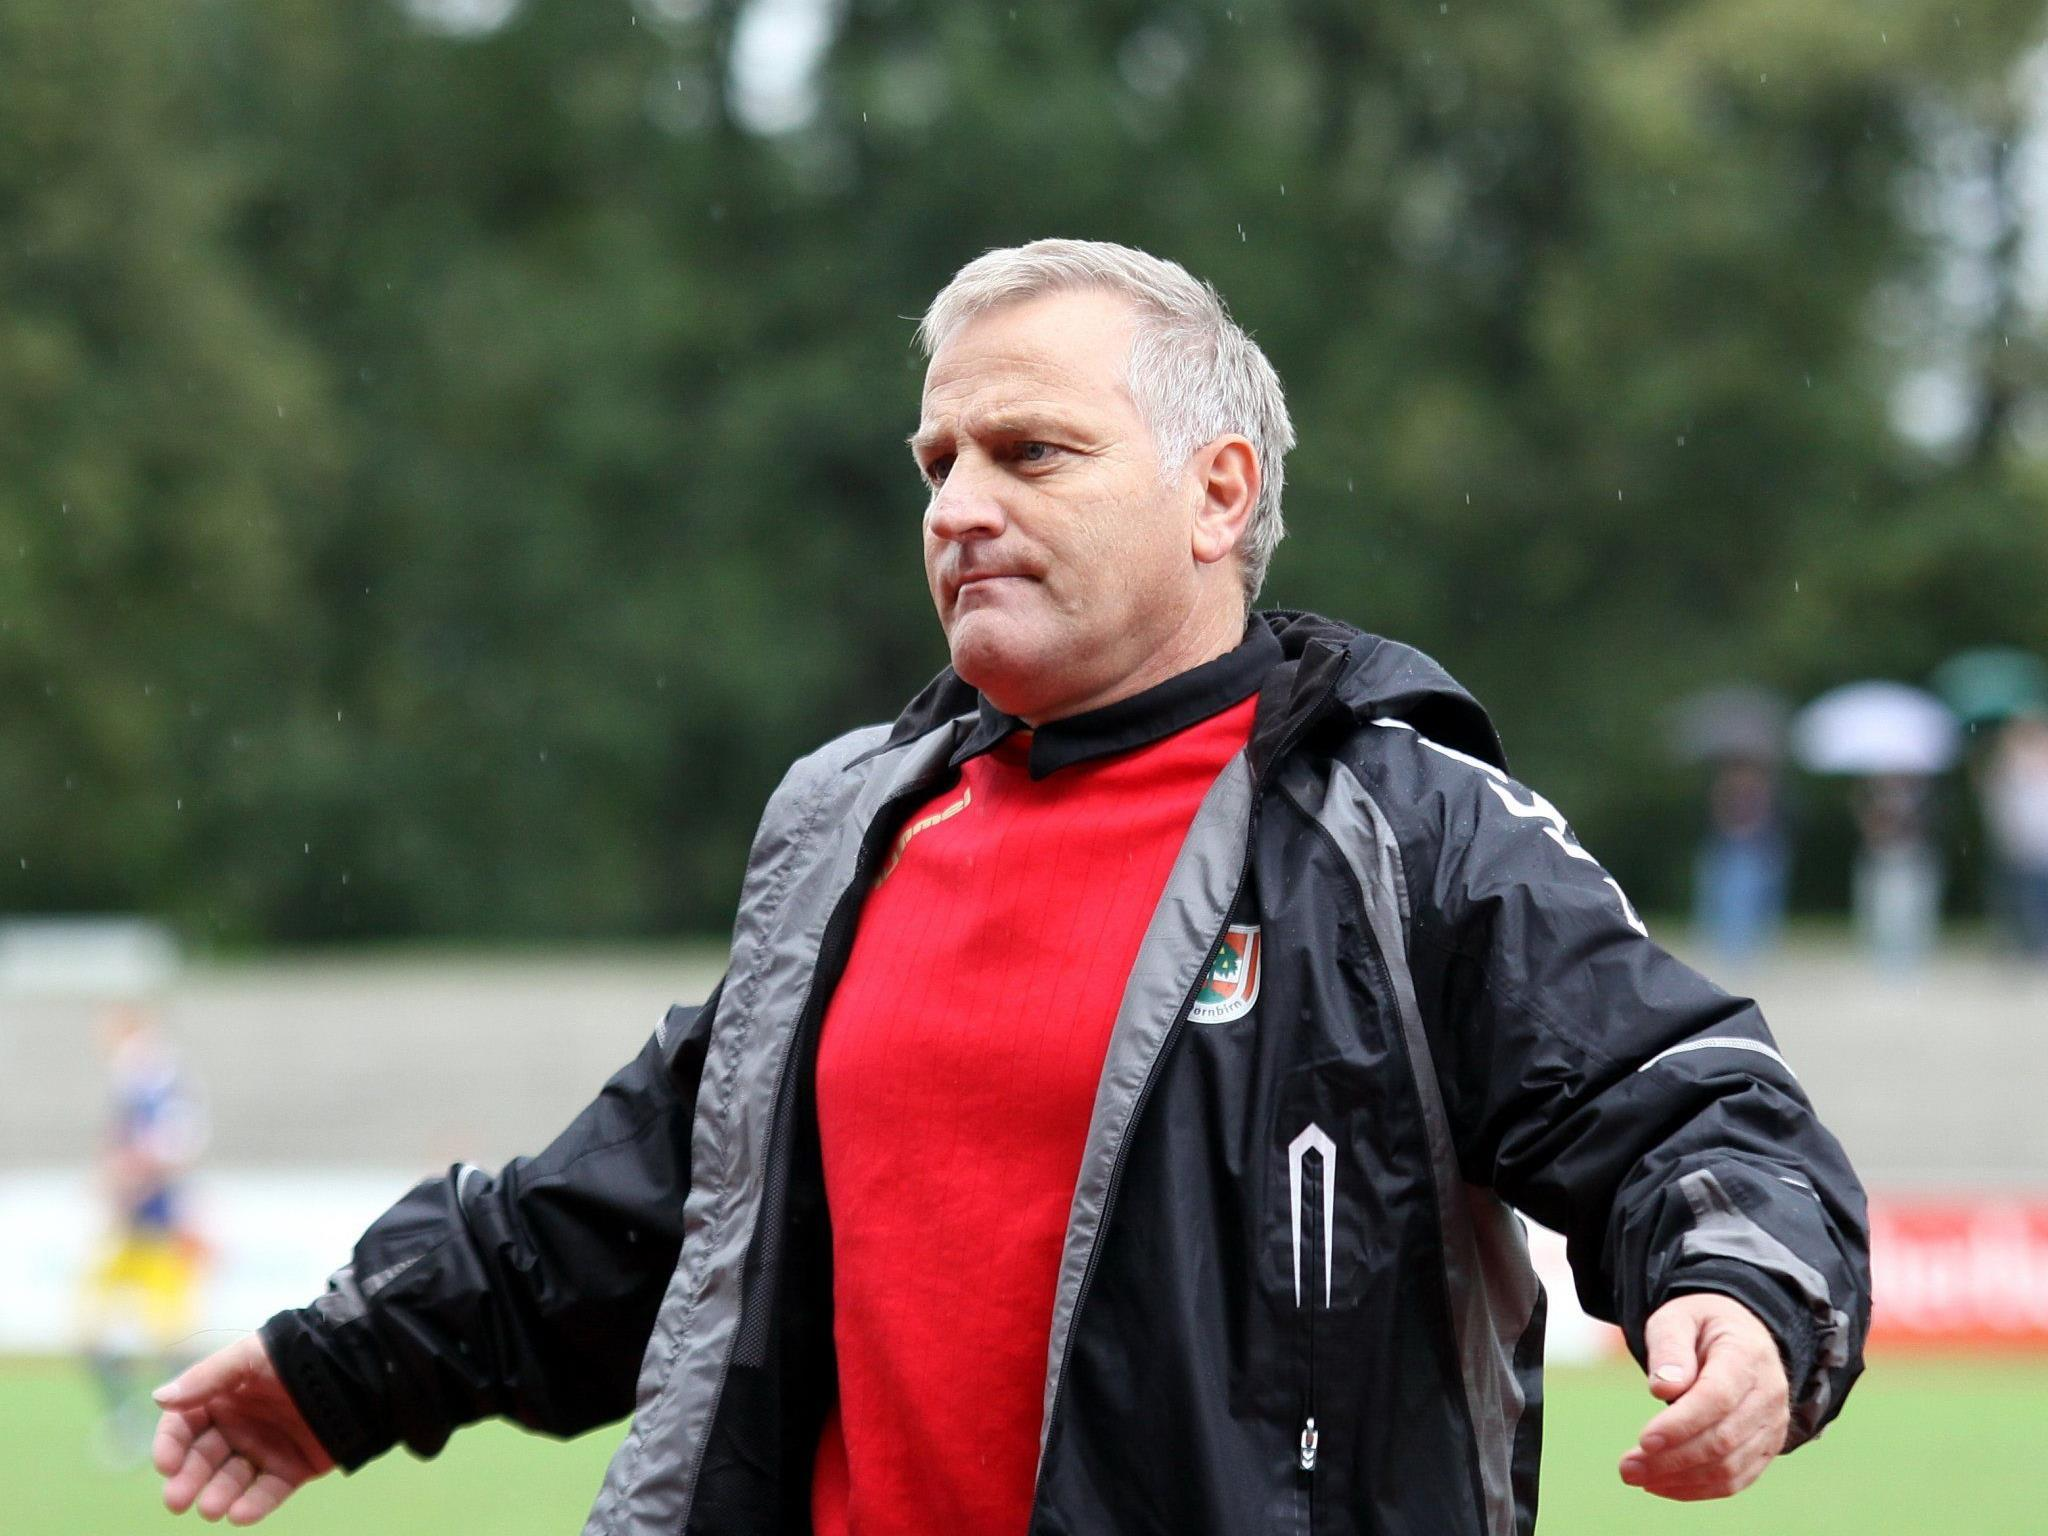 Erfolgscoach Peter Sallmayer empfängt mit Dornbirn den Ligakonkurrent Rivella SC Bregenz.